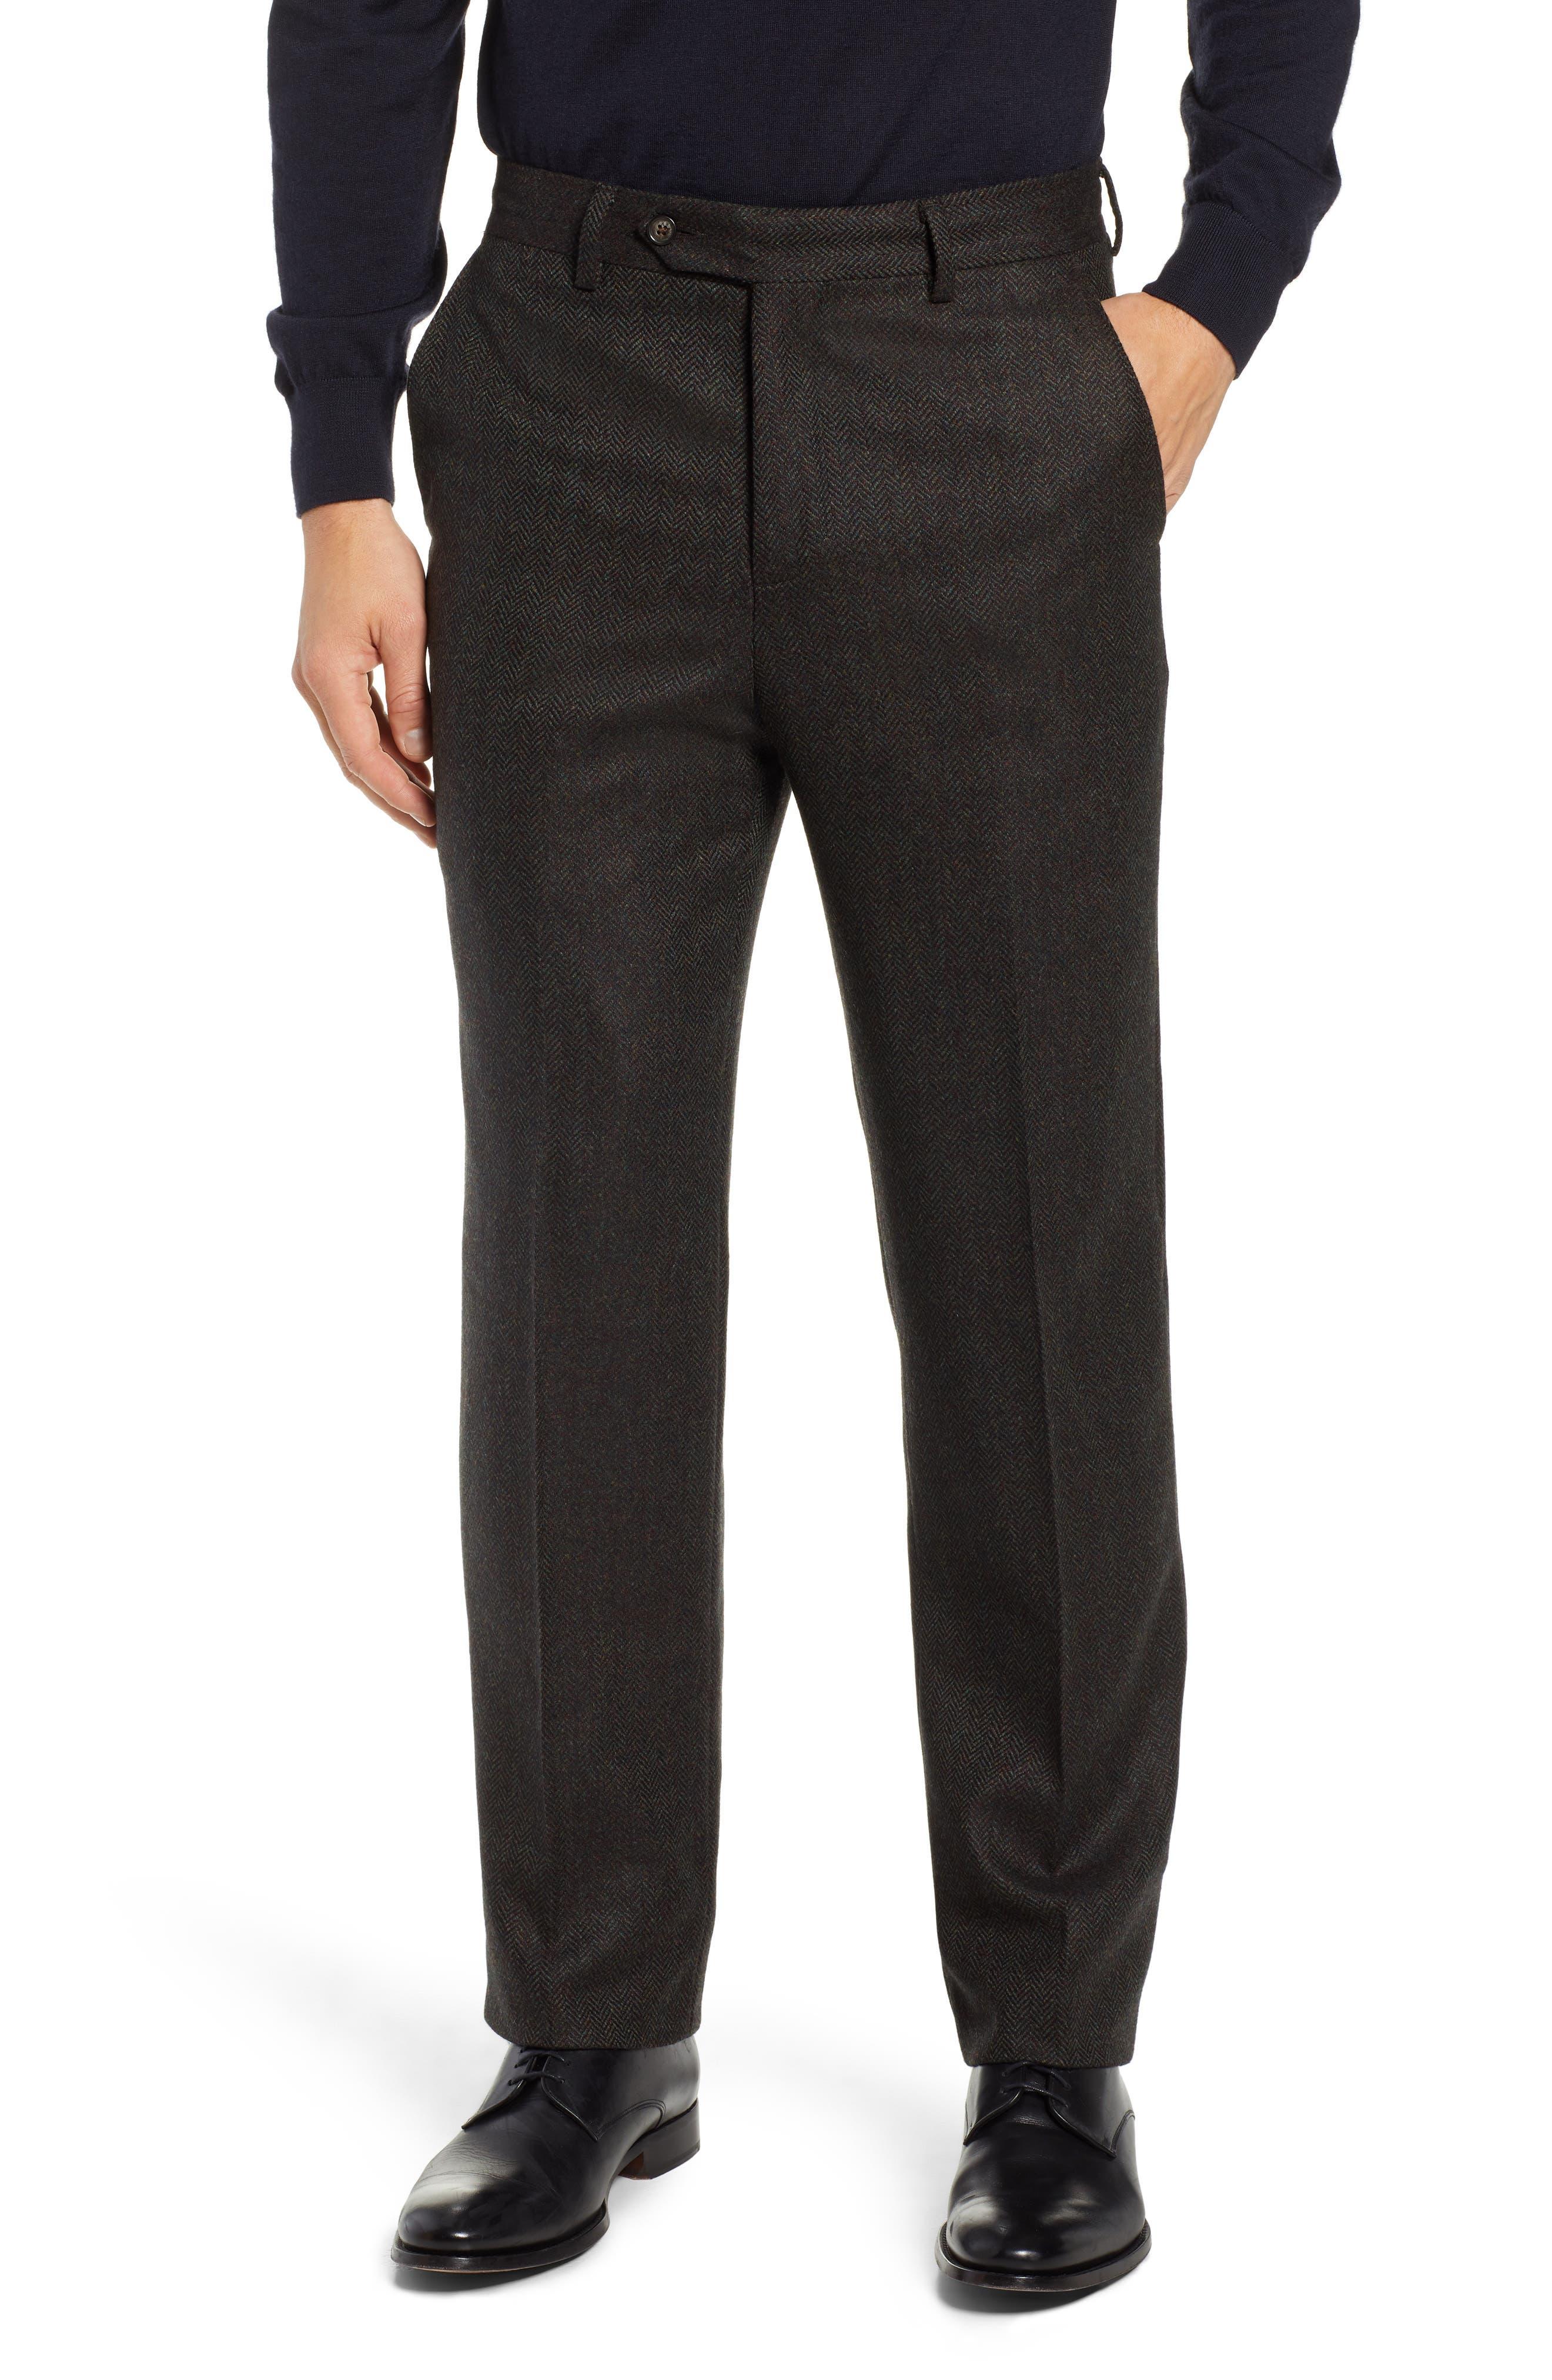 Flat Front Herringbone Wool & Cashmere Trousers,                             Main thumbnail 1, color,                             DARK OLIVE